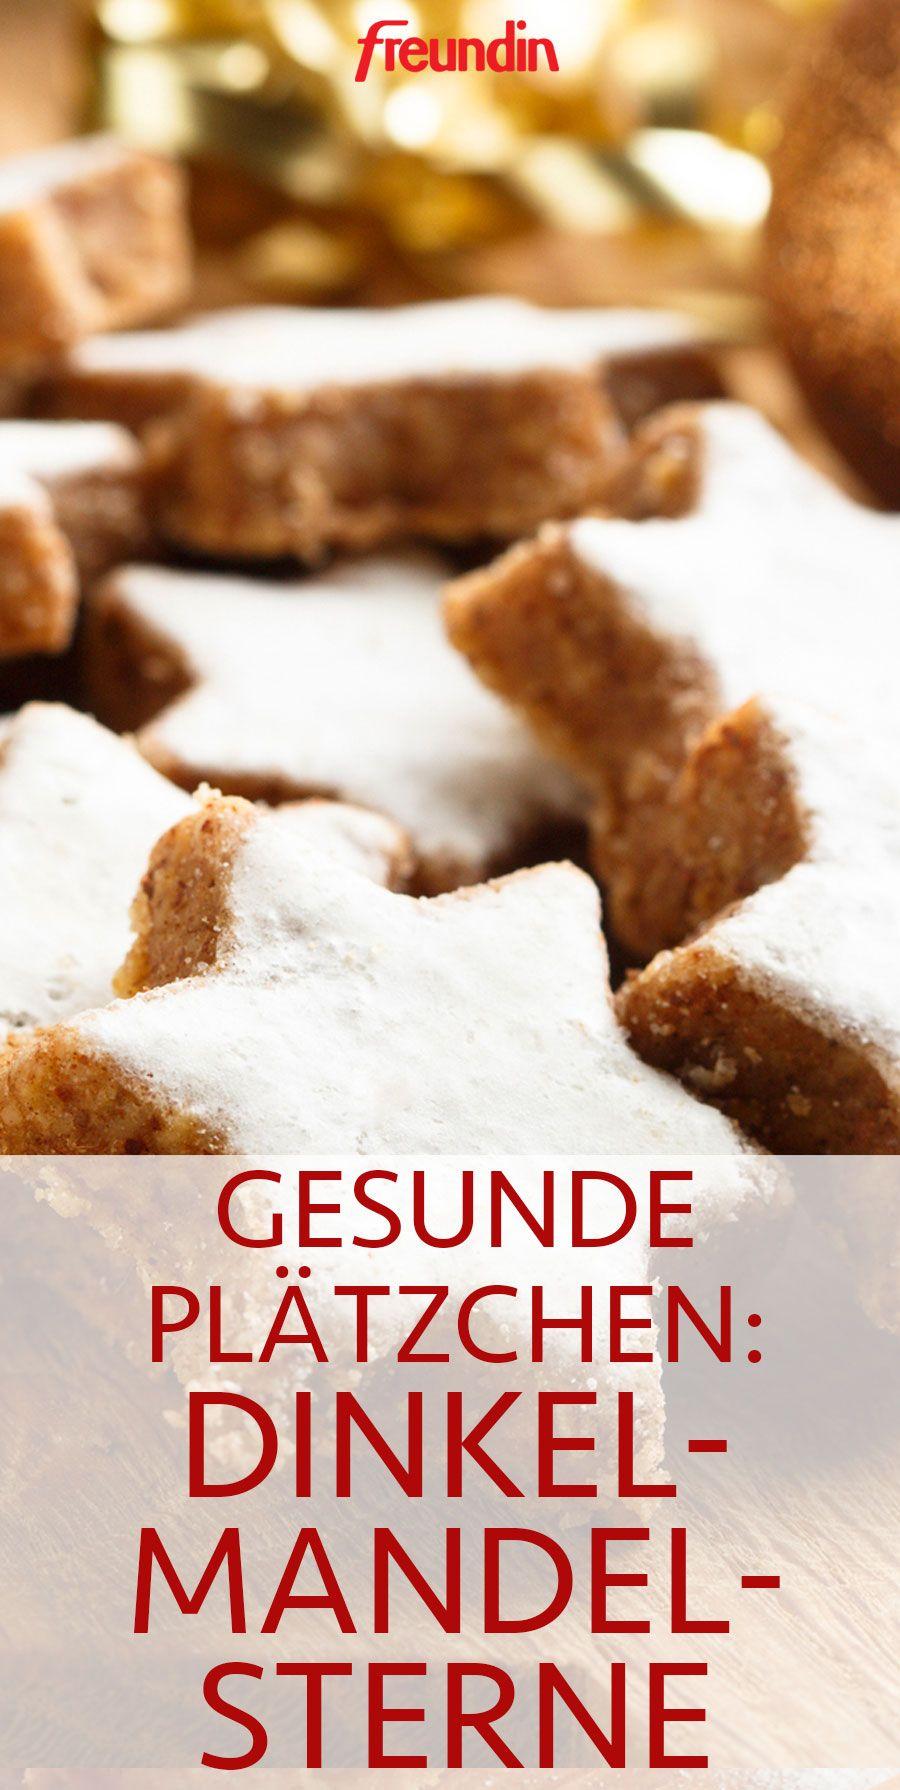 Gesunde Plätzchen: Dinkel-Mandel-Sterne #foodanddrink